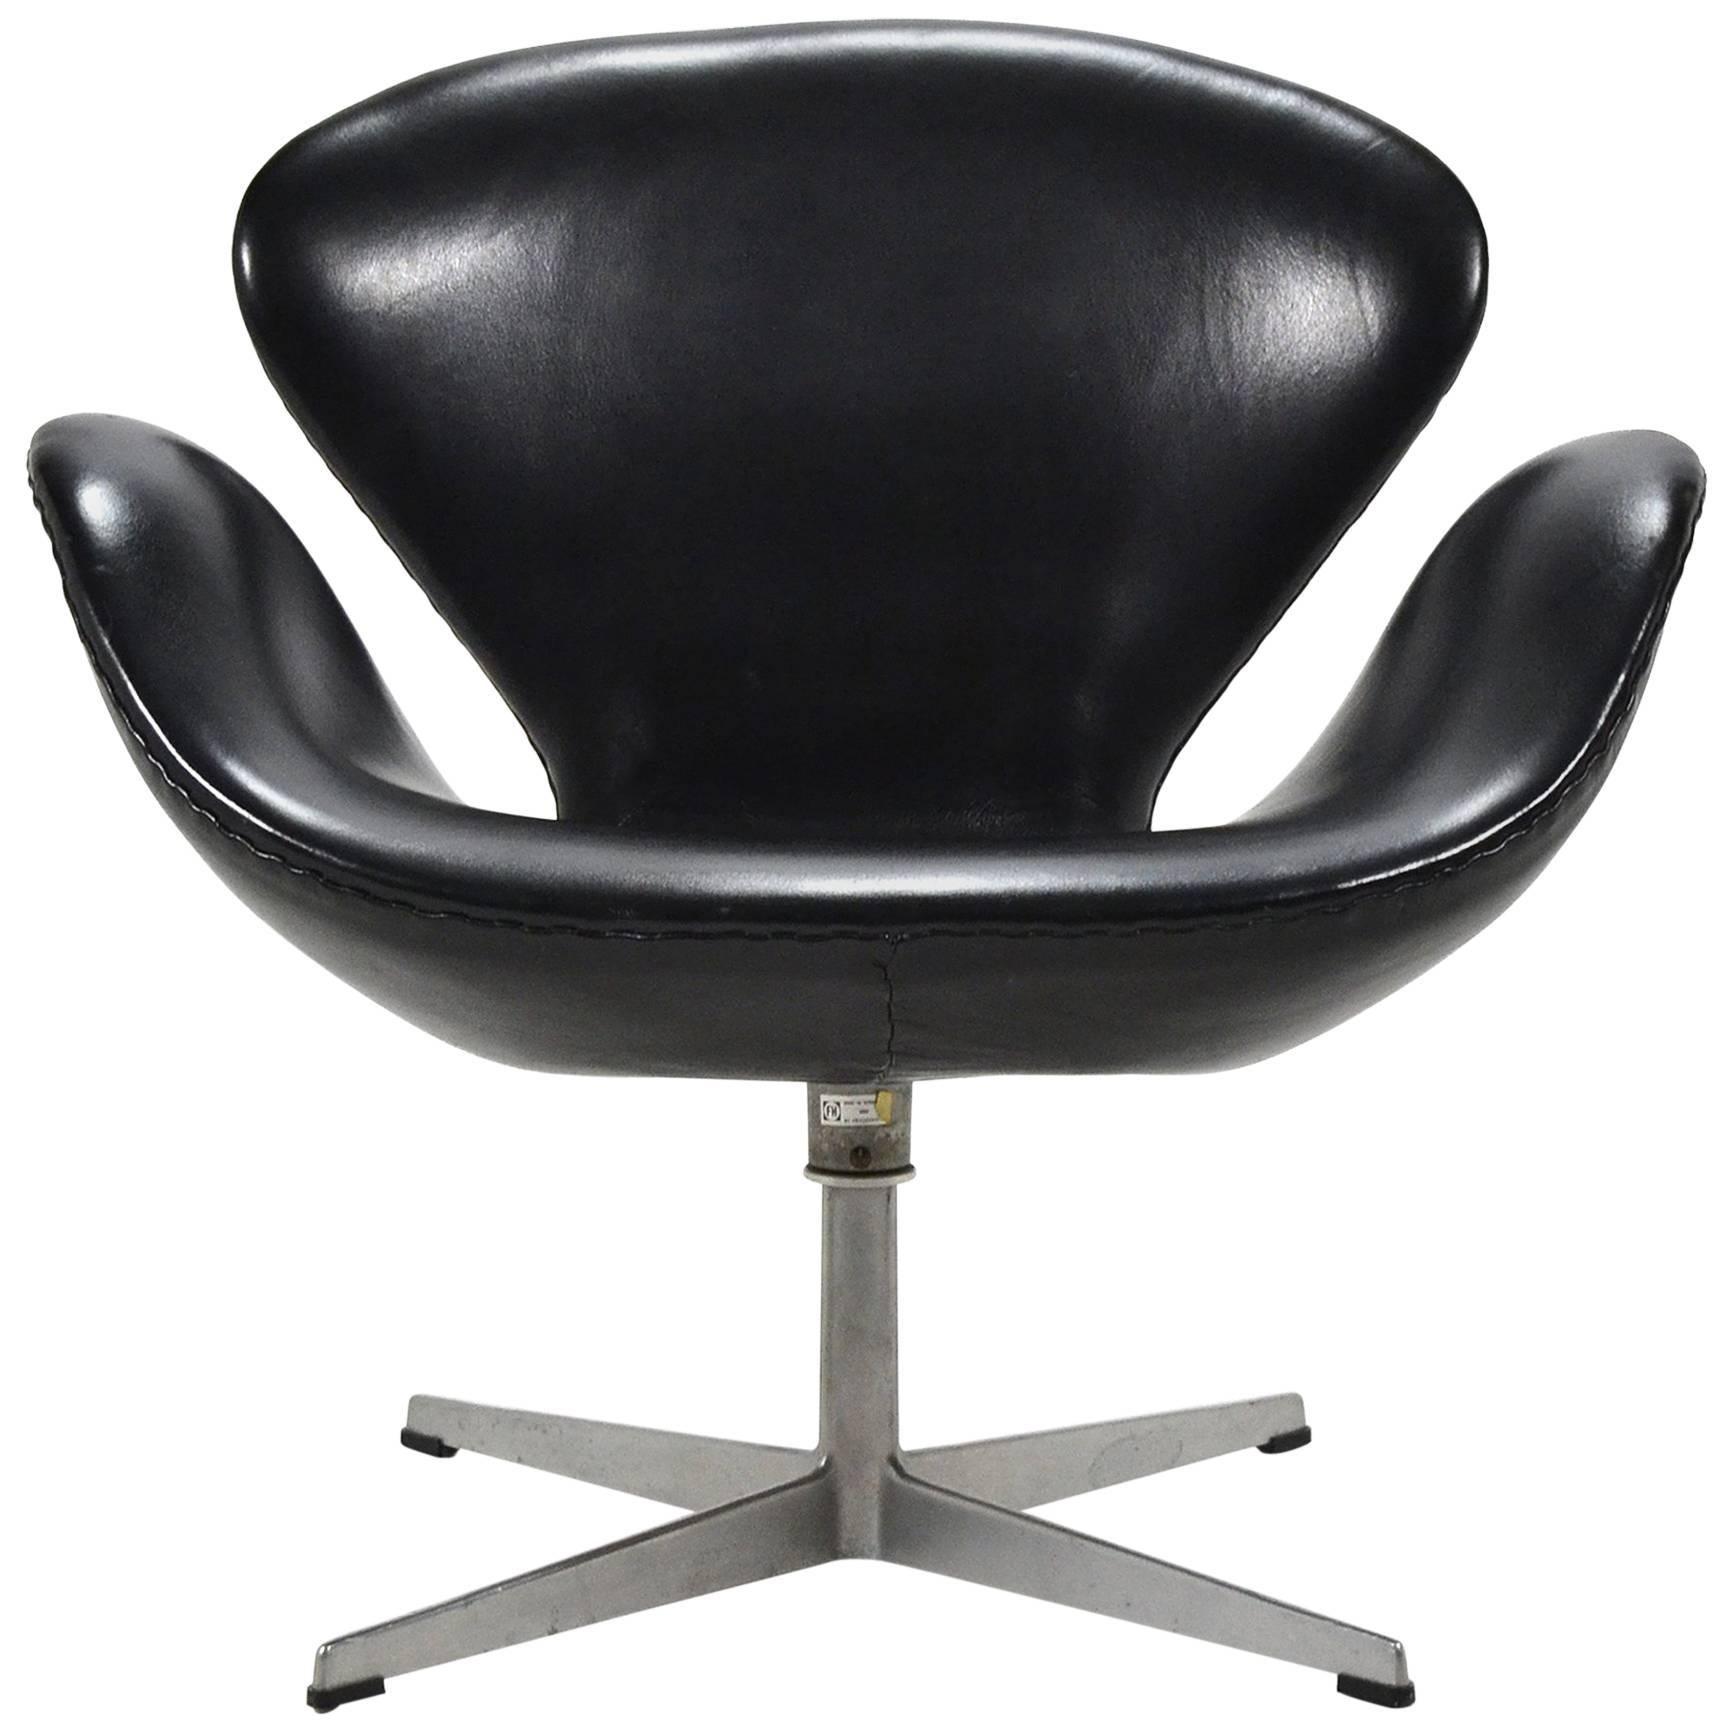 Arne Jacobsen Black Leather Swan Chair by Fritz Hansen